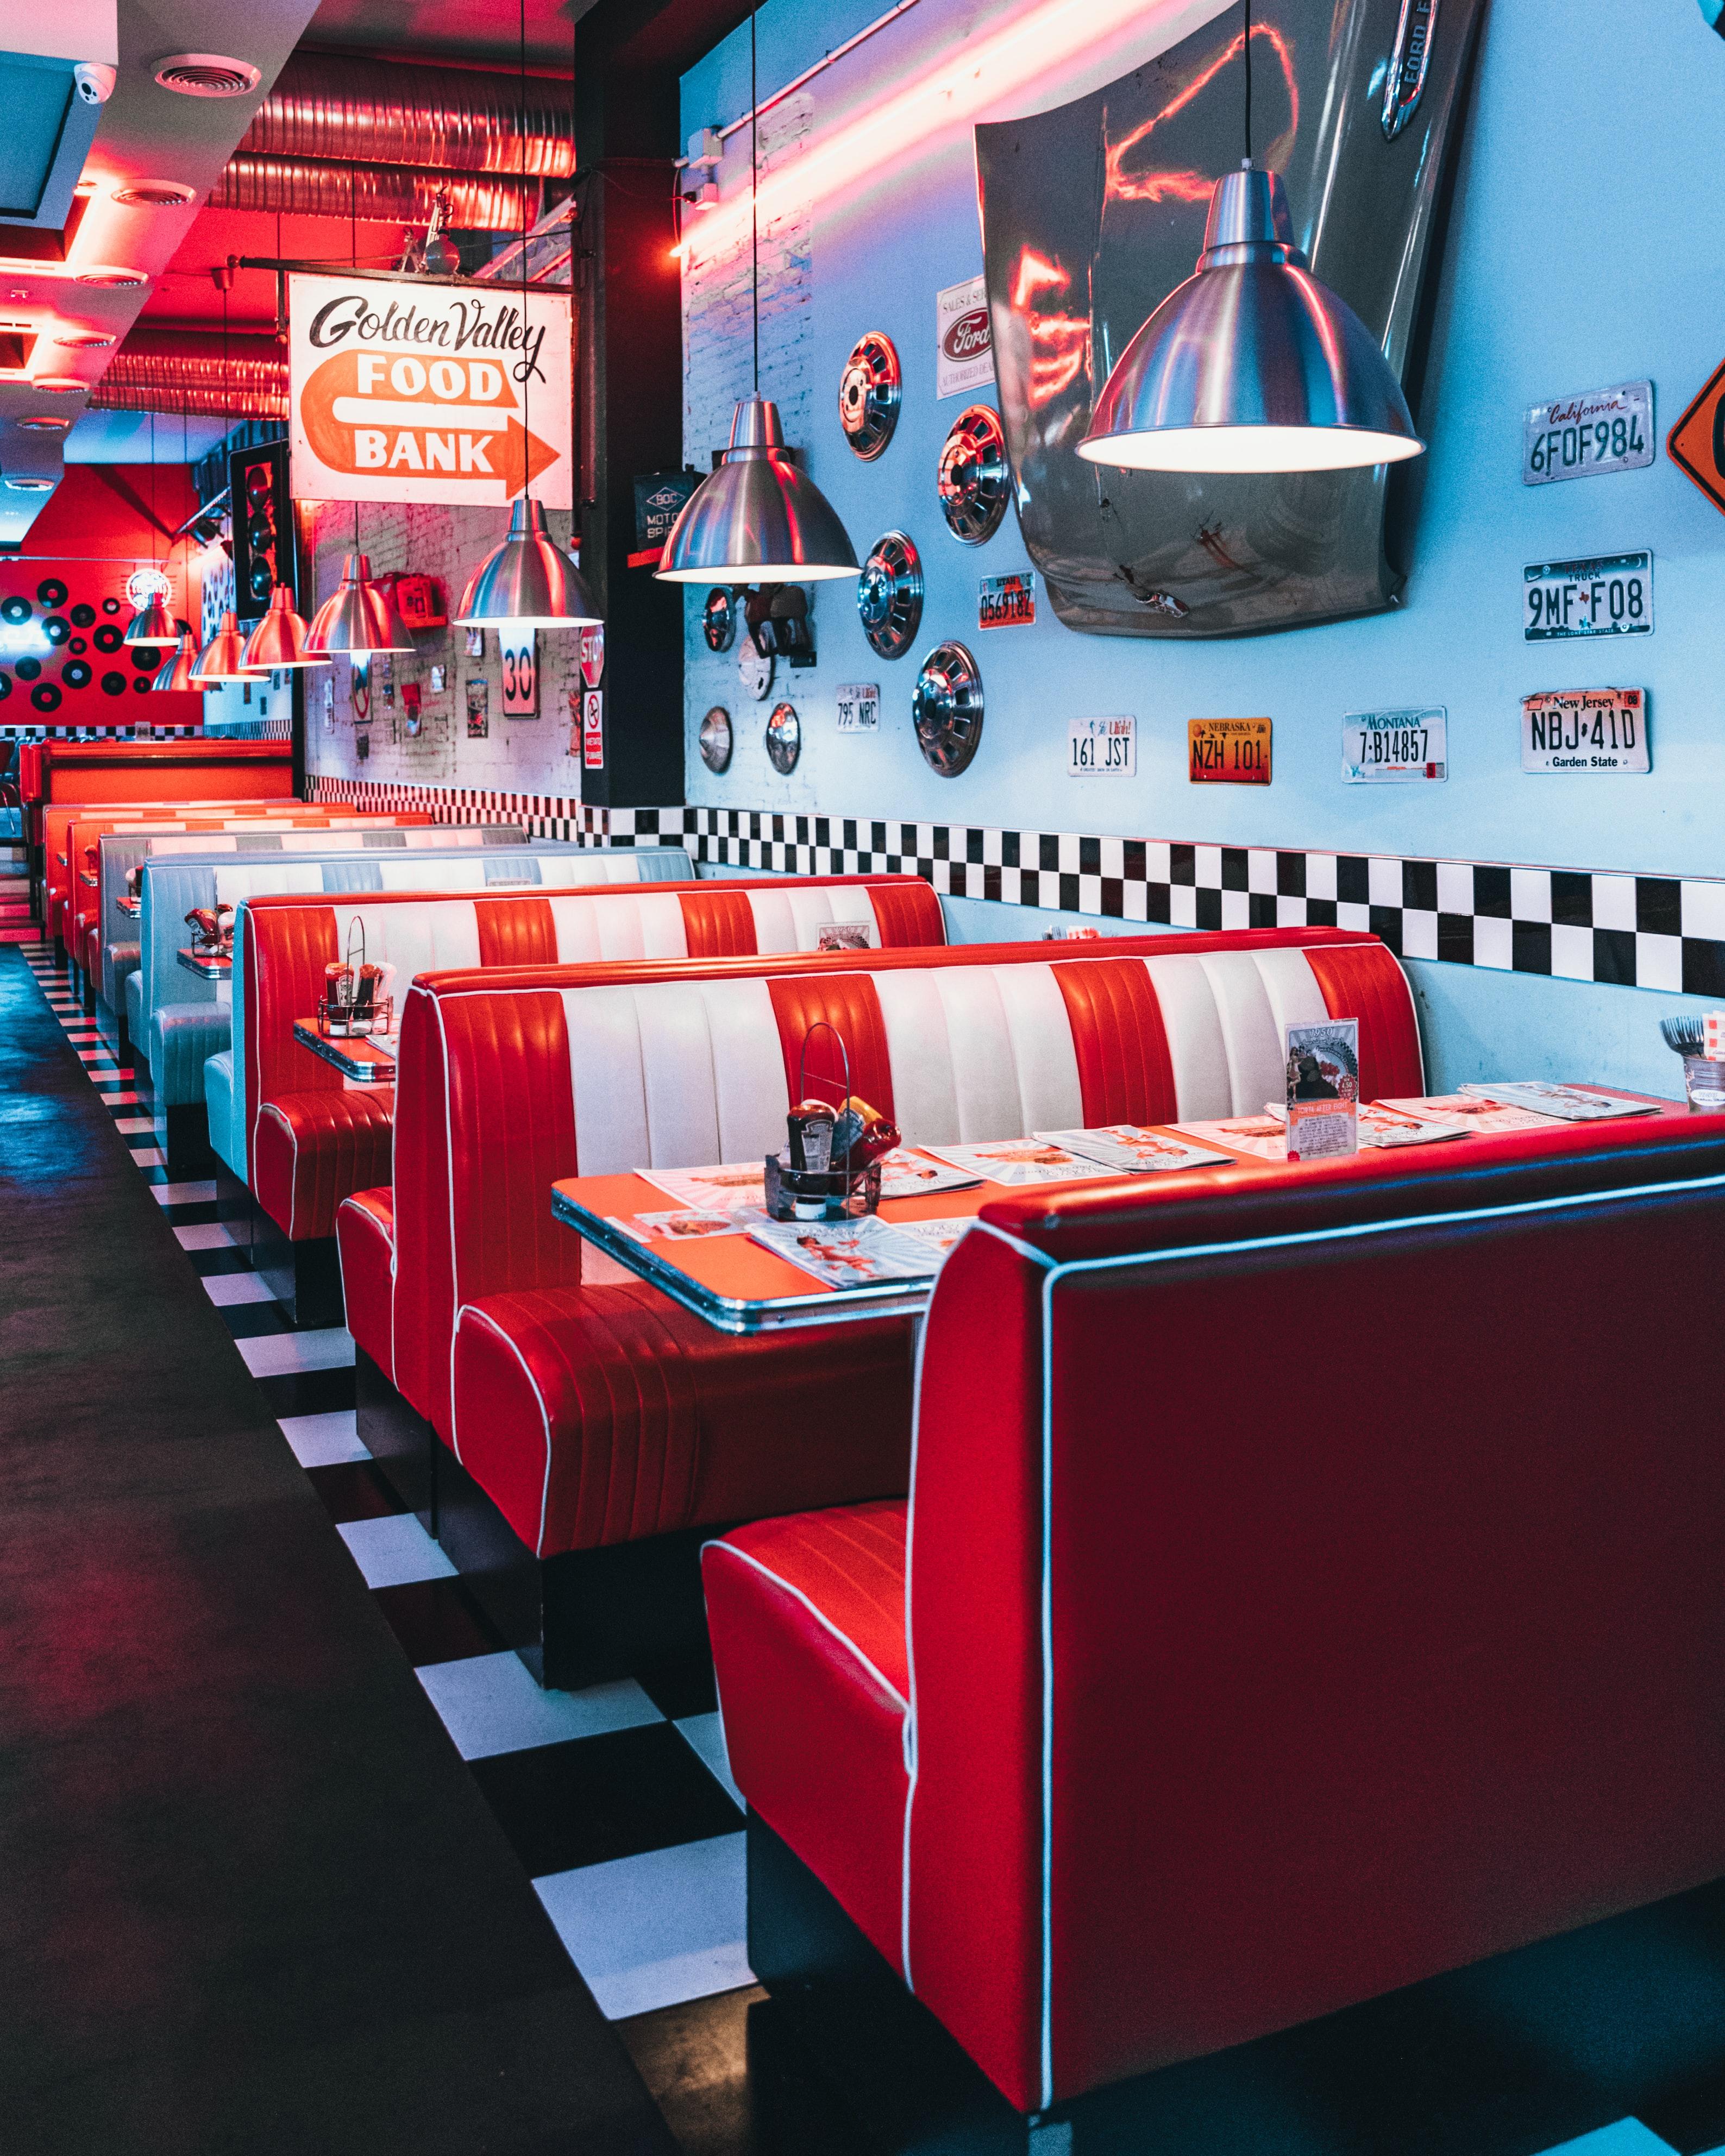 450 Diner Pictures Hd Download Free Images On Unsplash